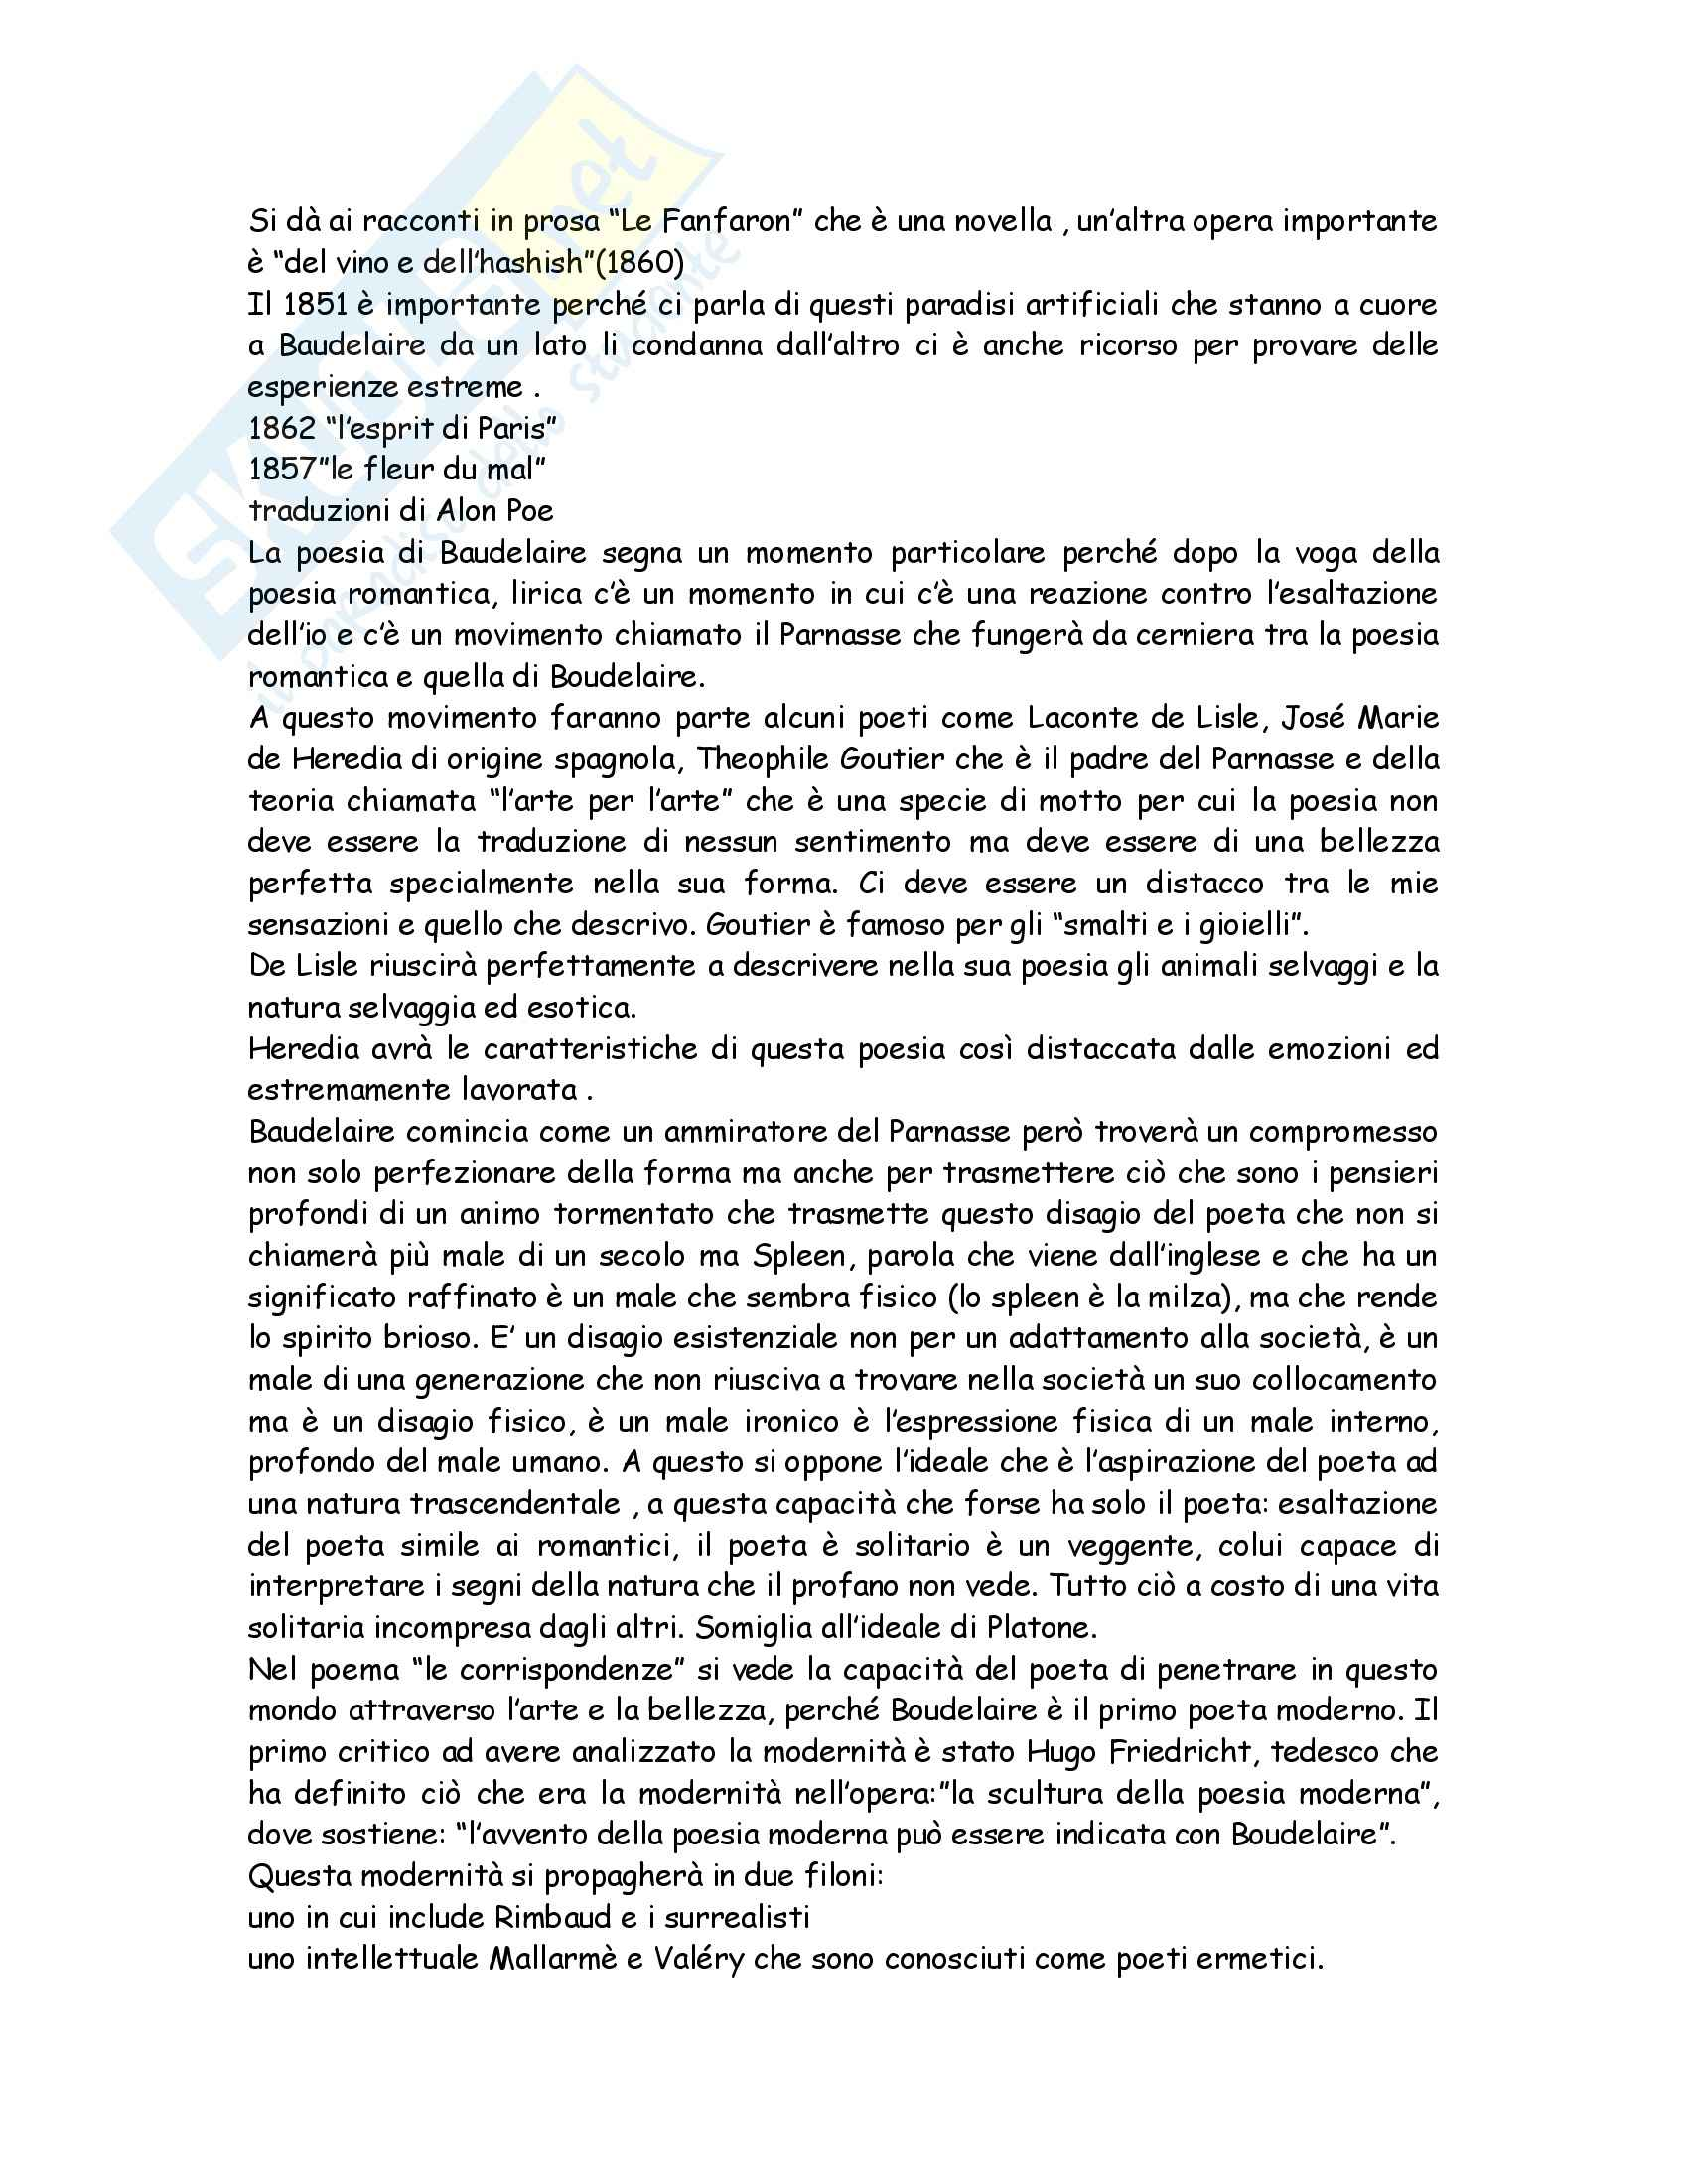 Letteratura francese - Madame Bovary, Ottocento e Novecento Pag. 51